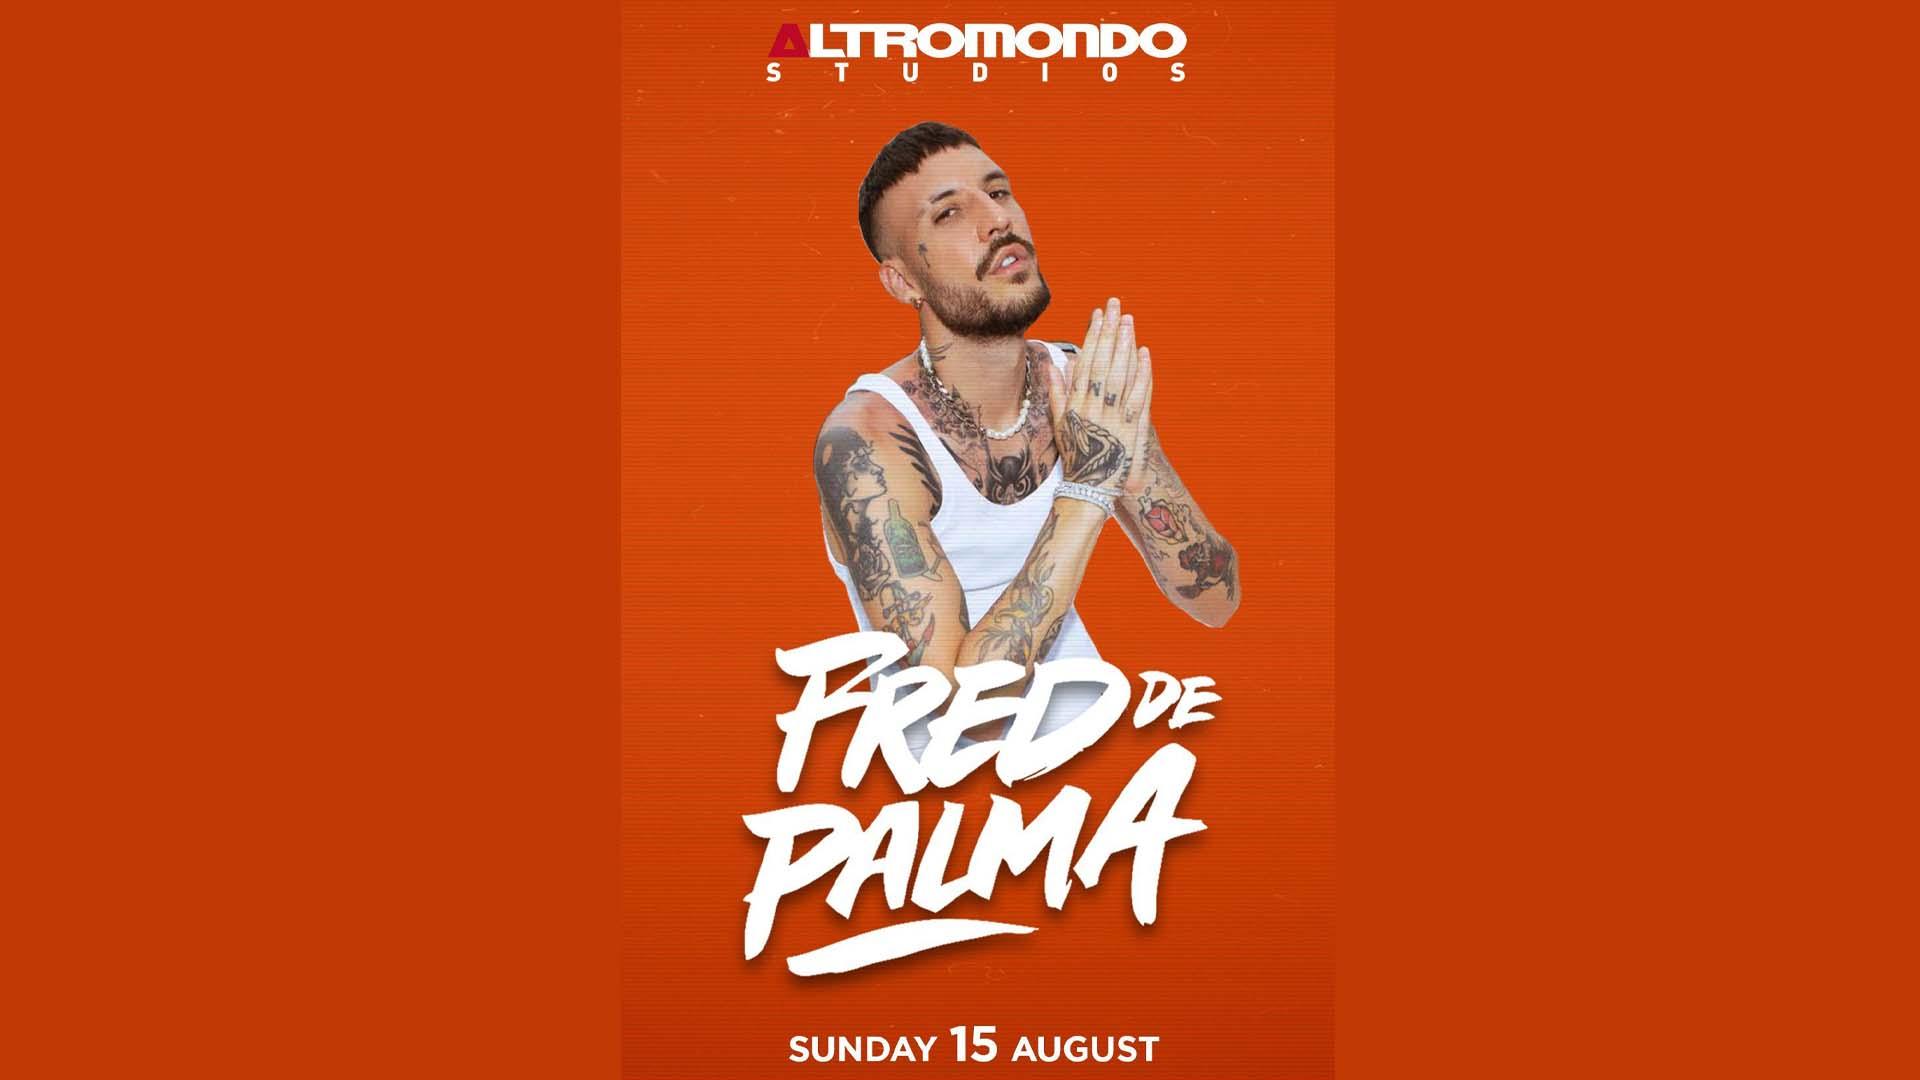 FRED DE PALMA ALTROMONDO STUDIOS 15 08 2021